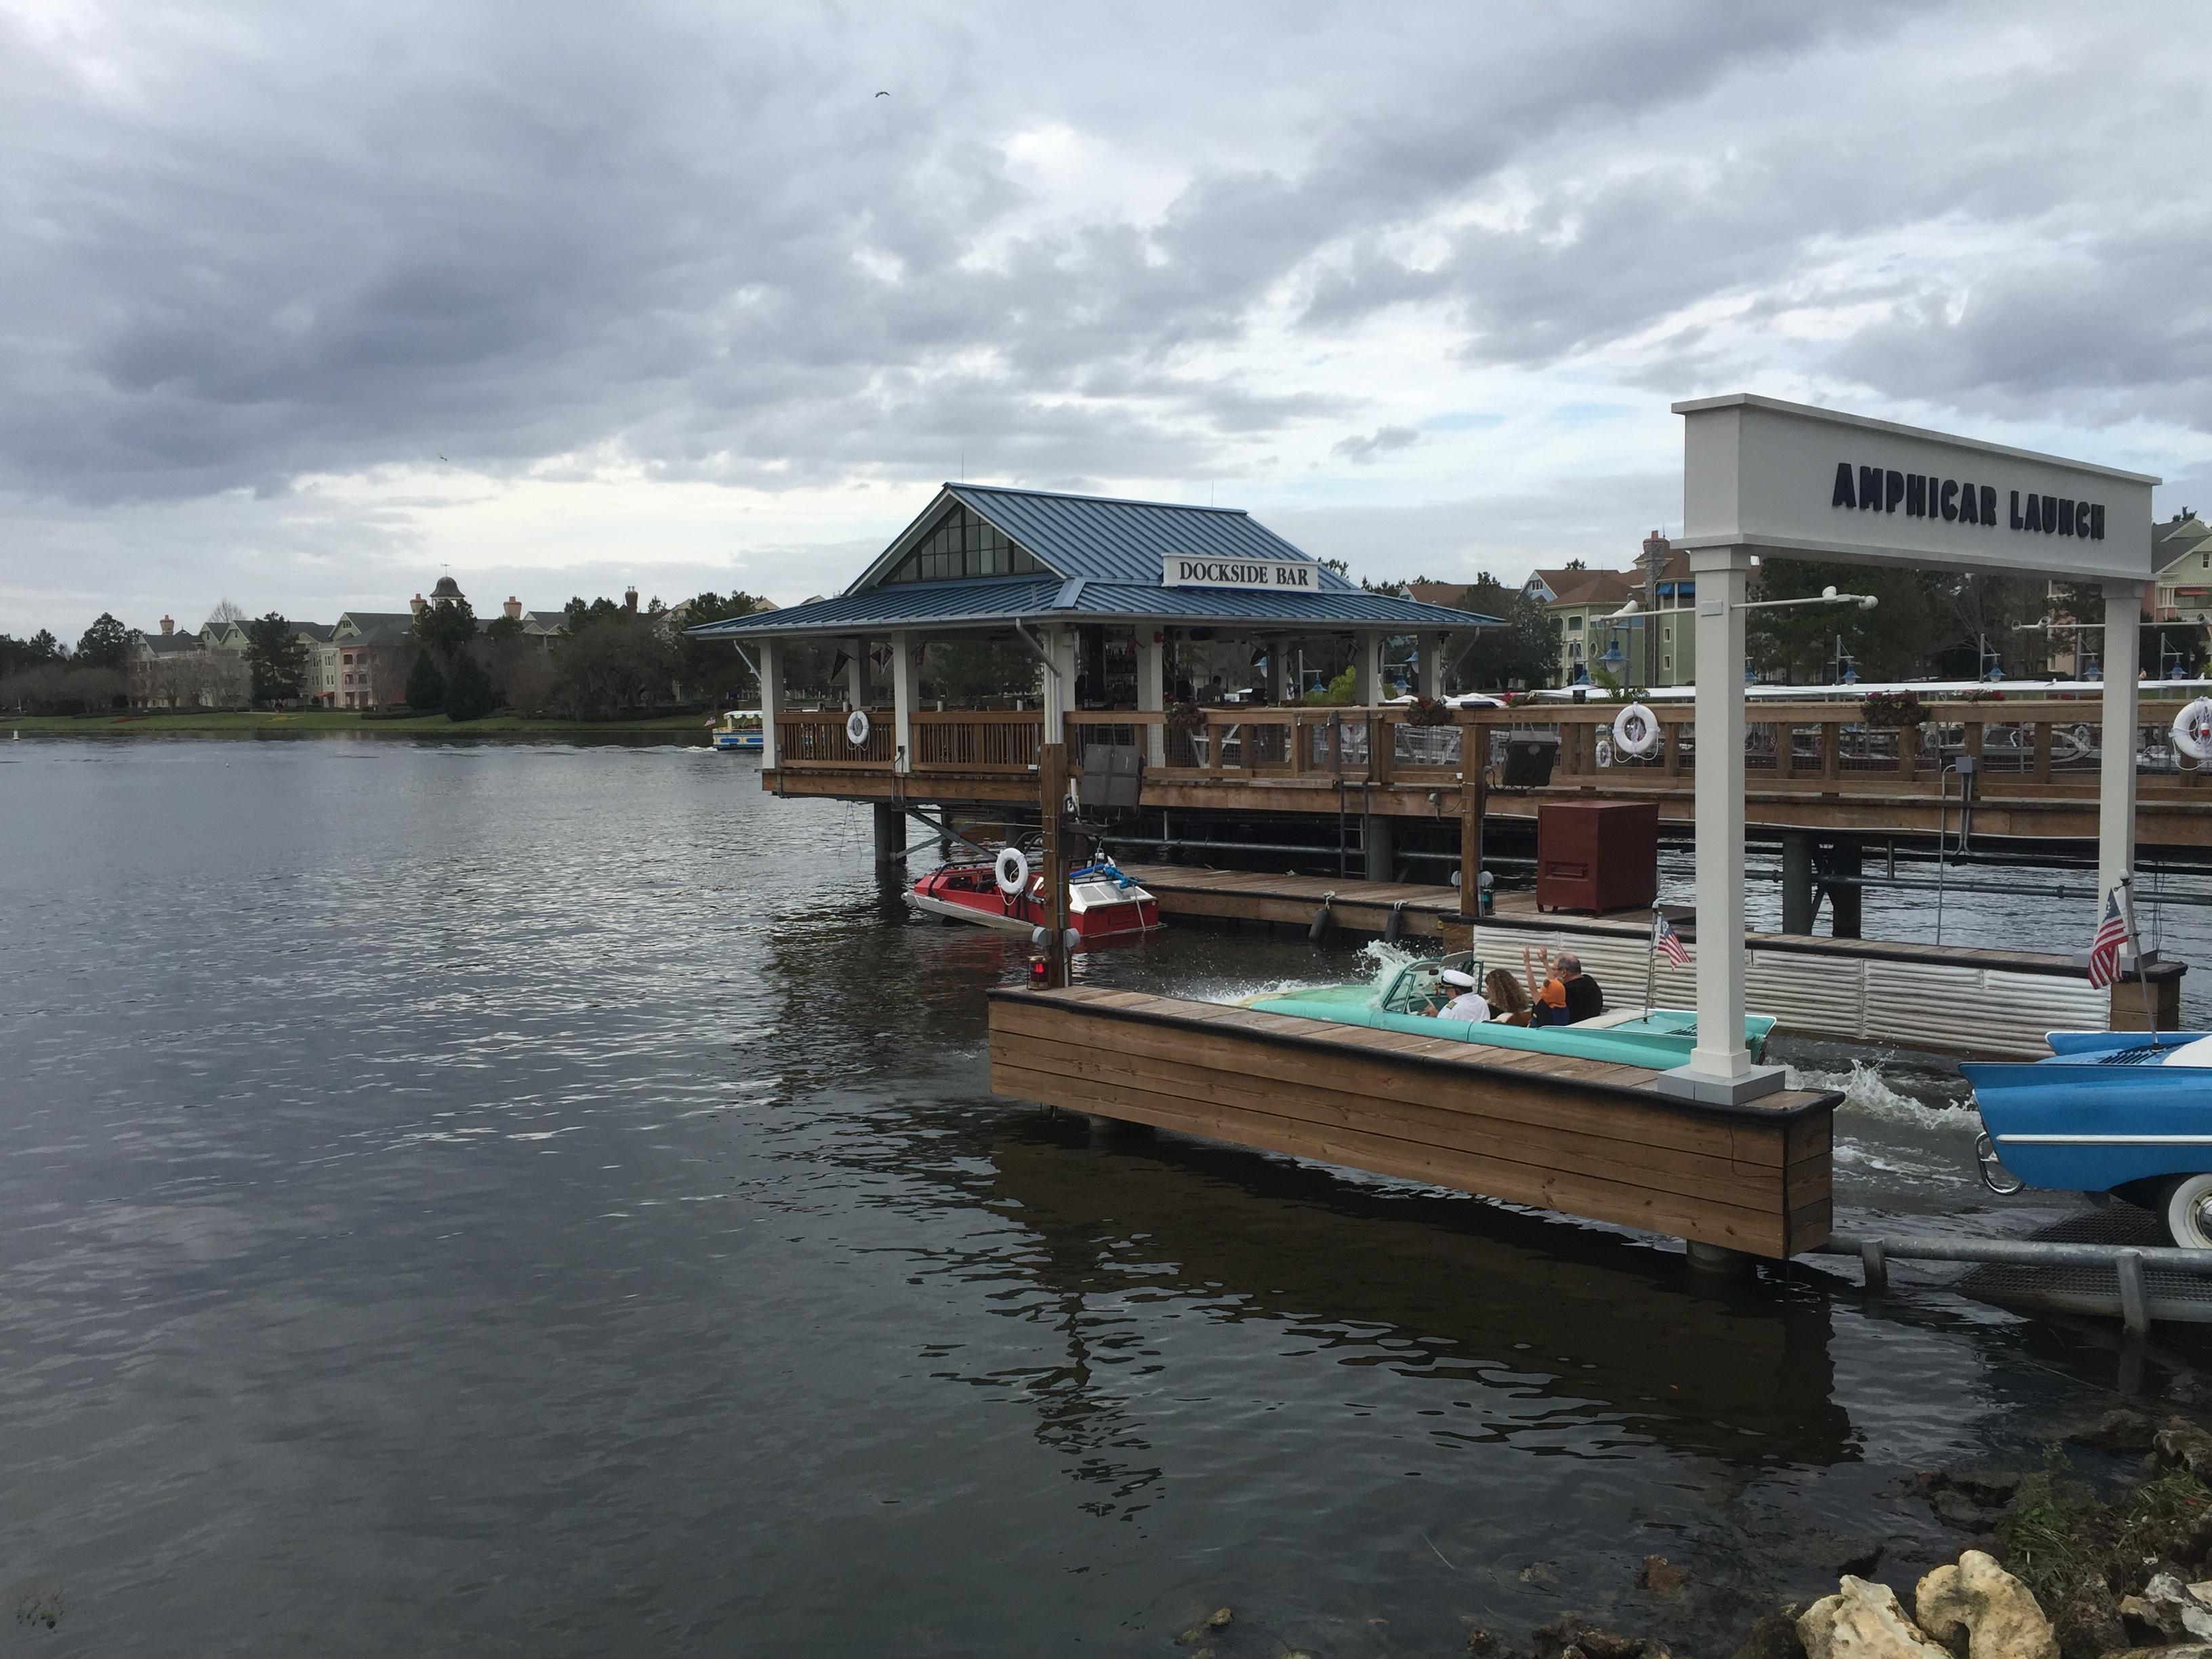 disney valentine's day amphicar boathouse